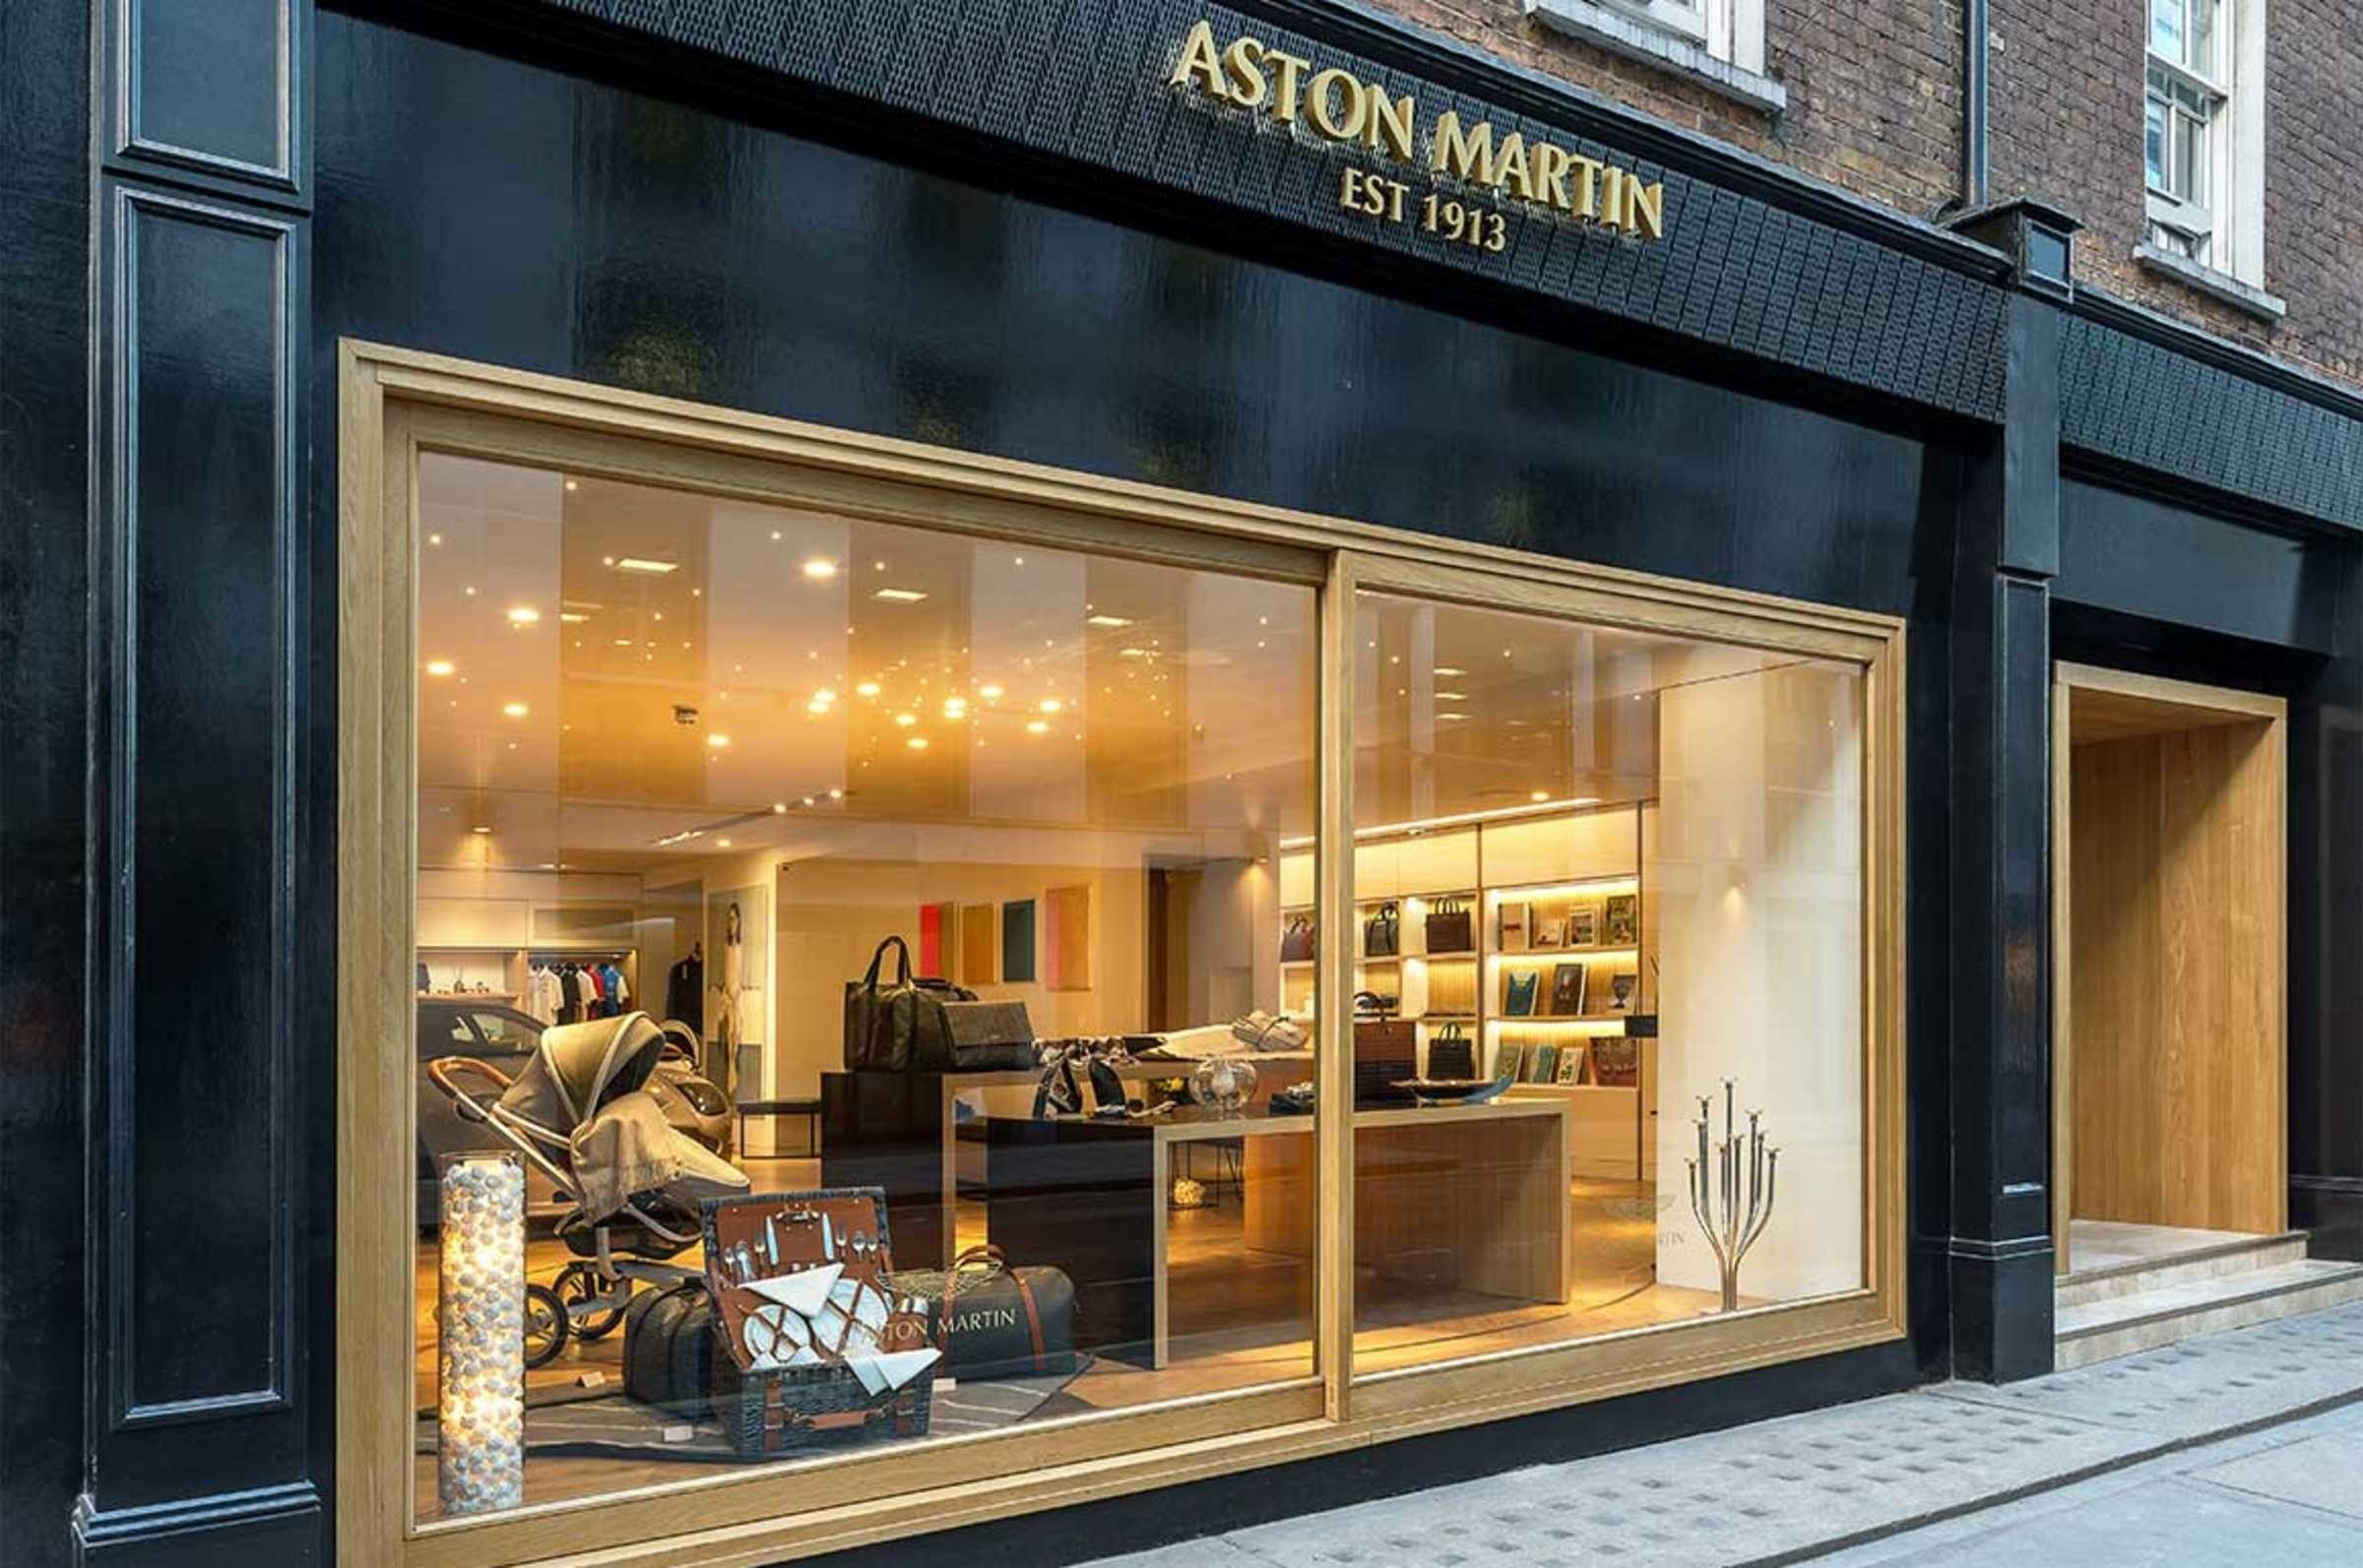 20 Möbel Aston Martin Ideen Möbelideen Futuristische Möbel Büromöbel Design